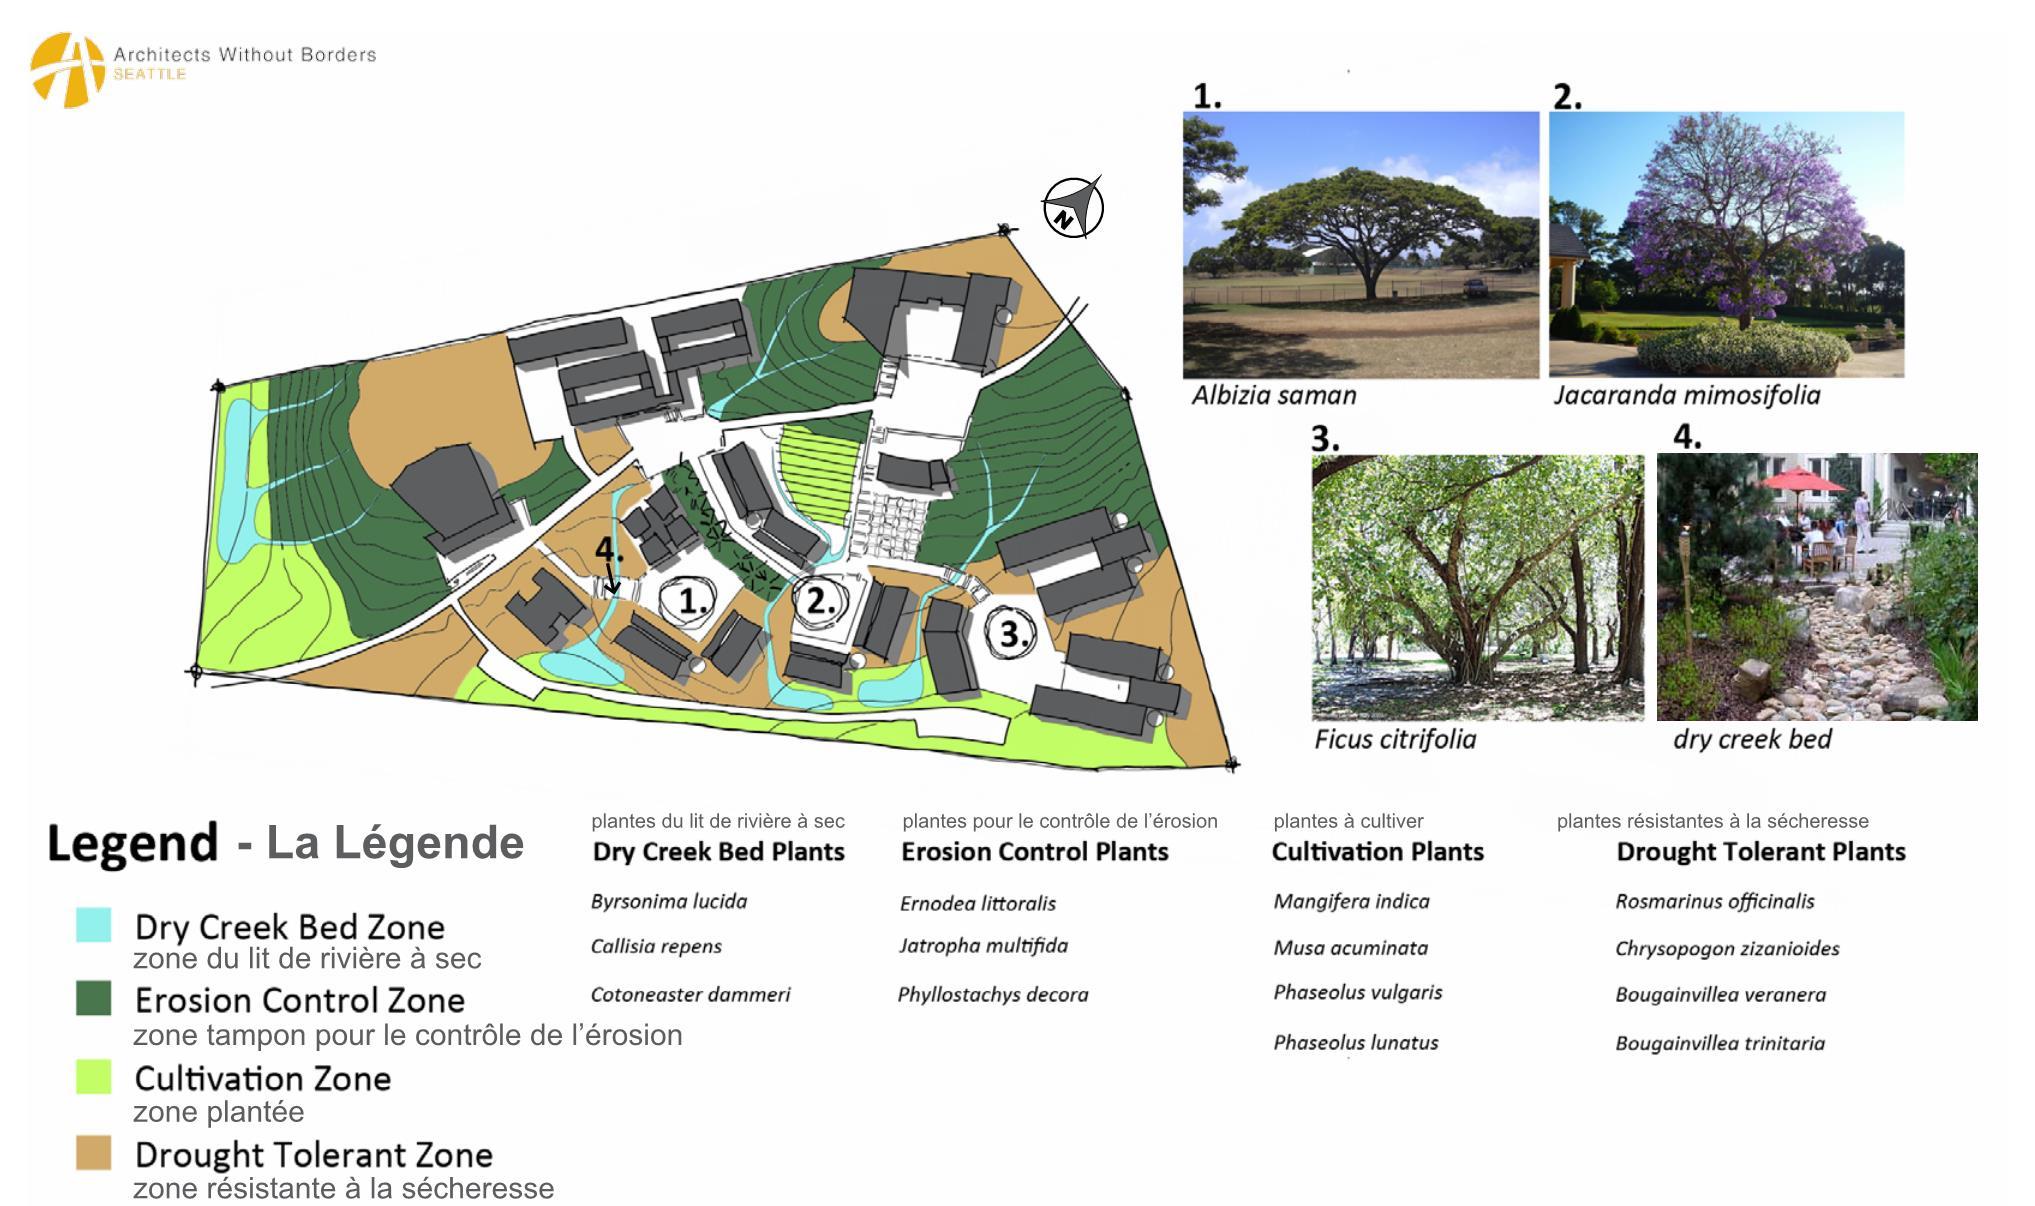 landscape-site-plan_18947600791_o